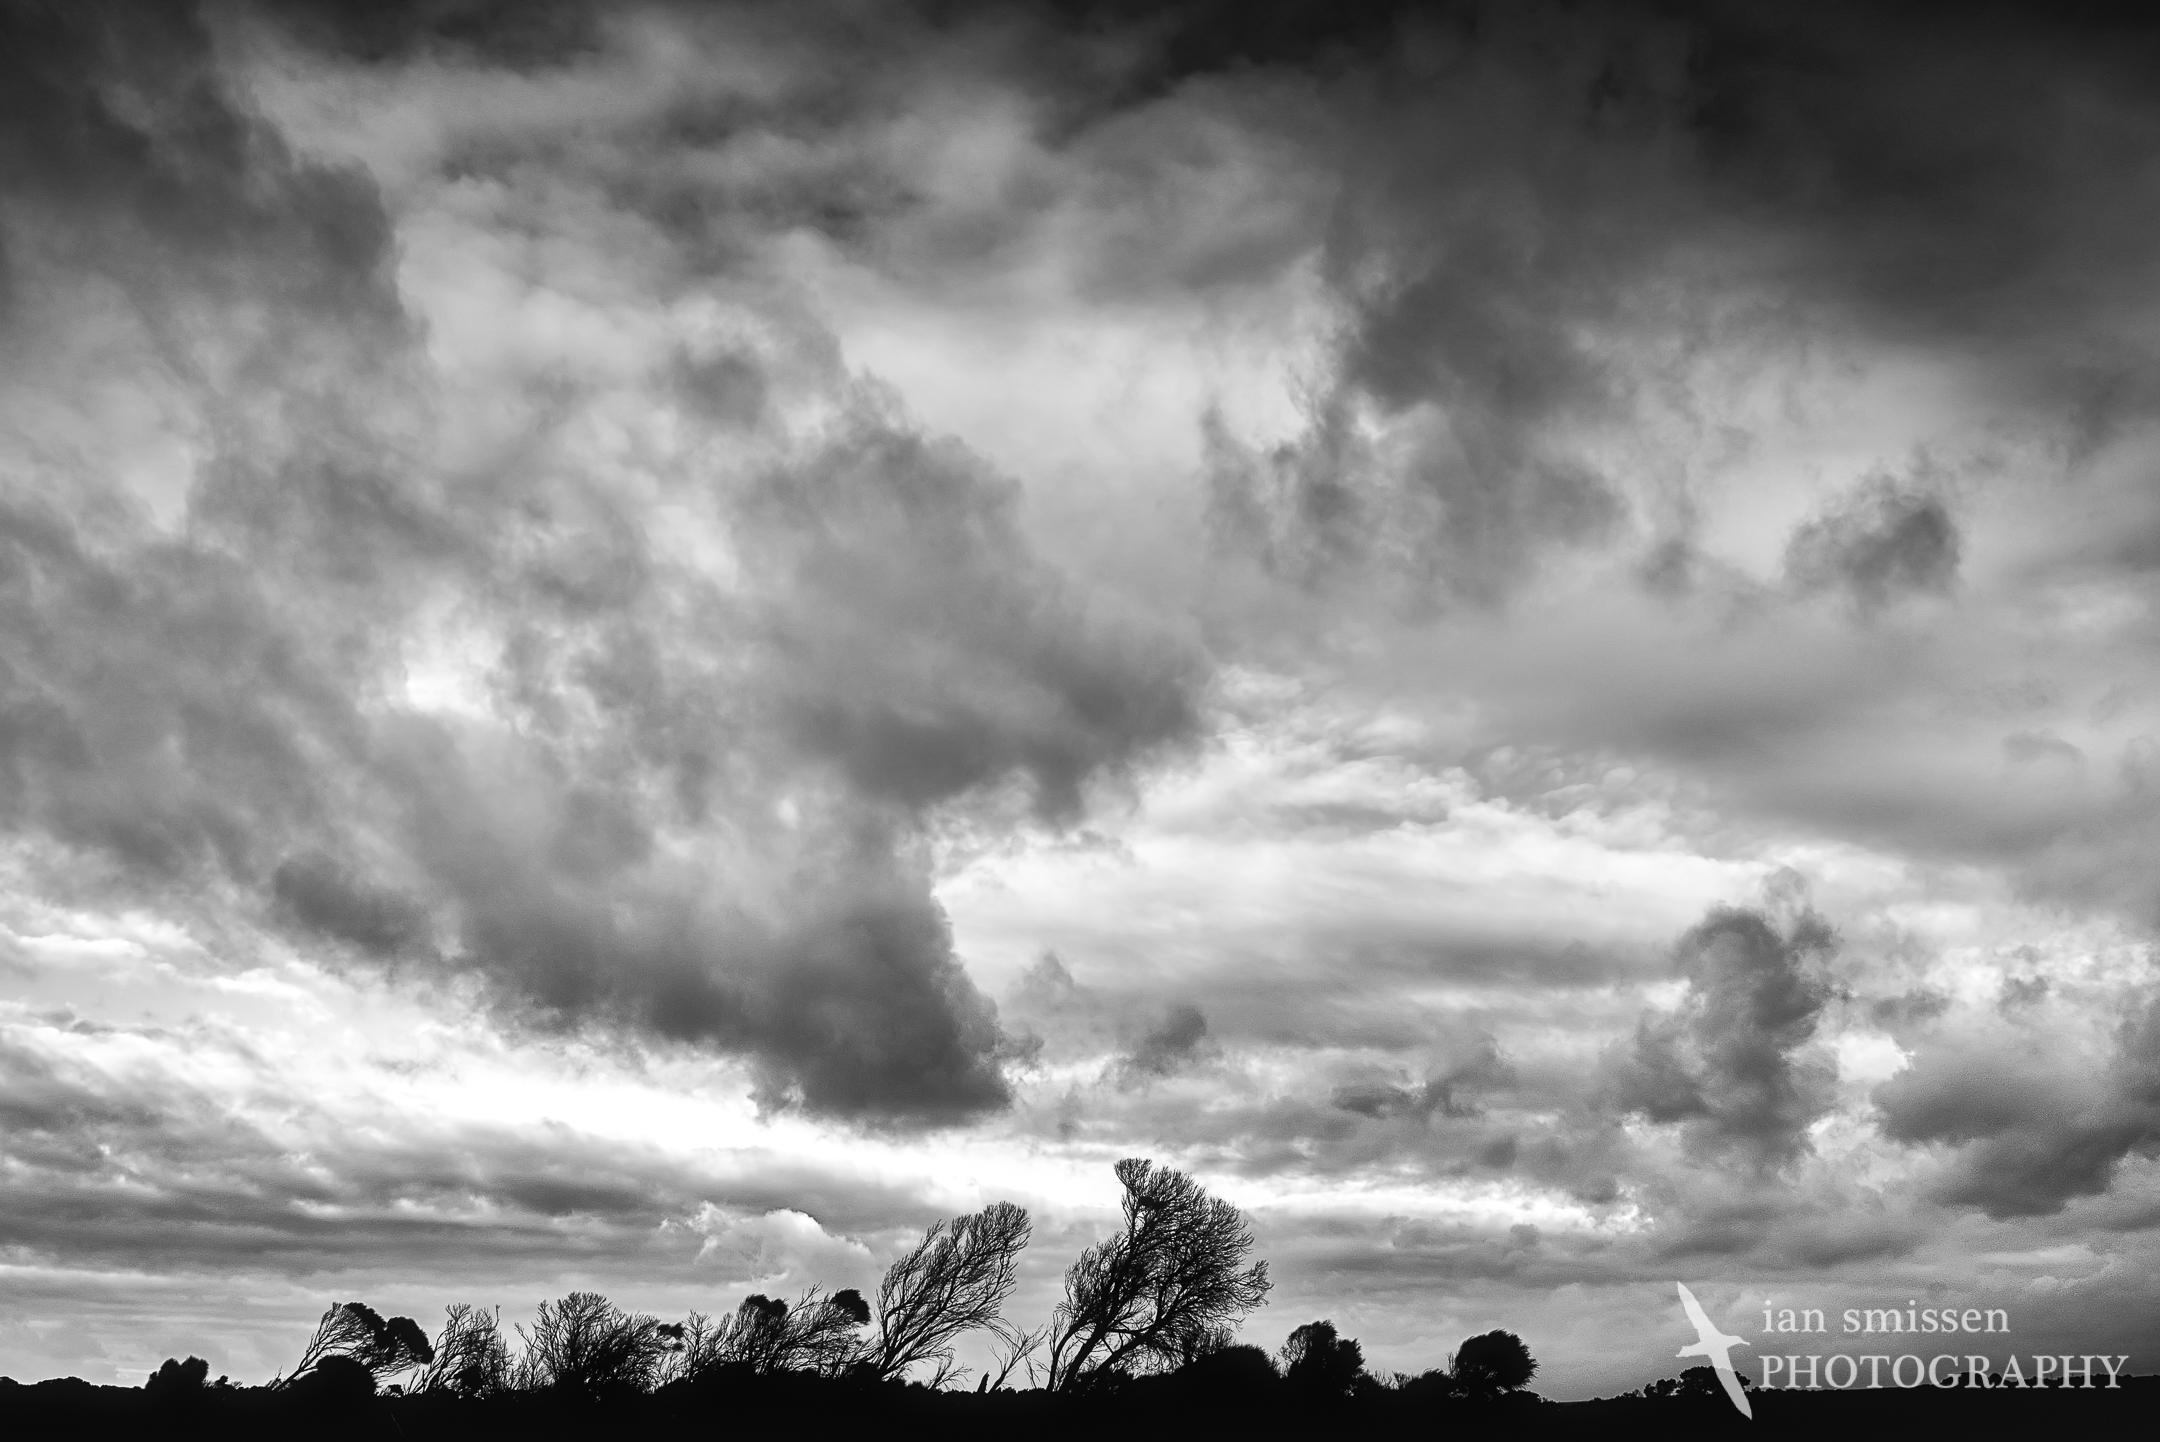 Sky over Loch Ard Gorge